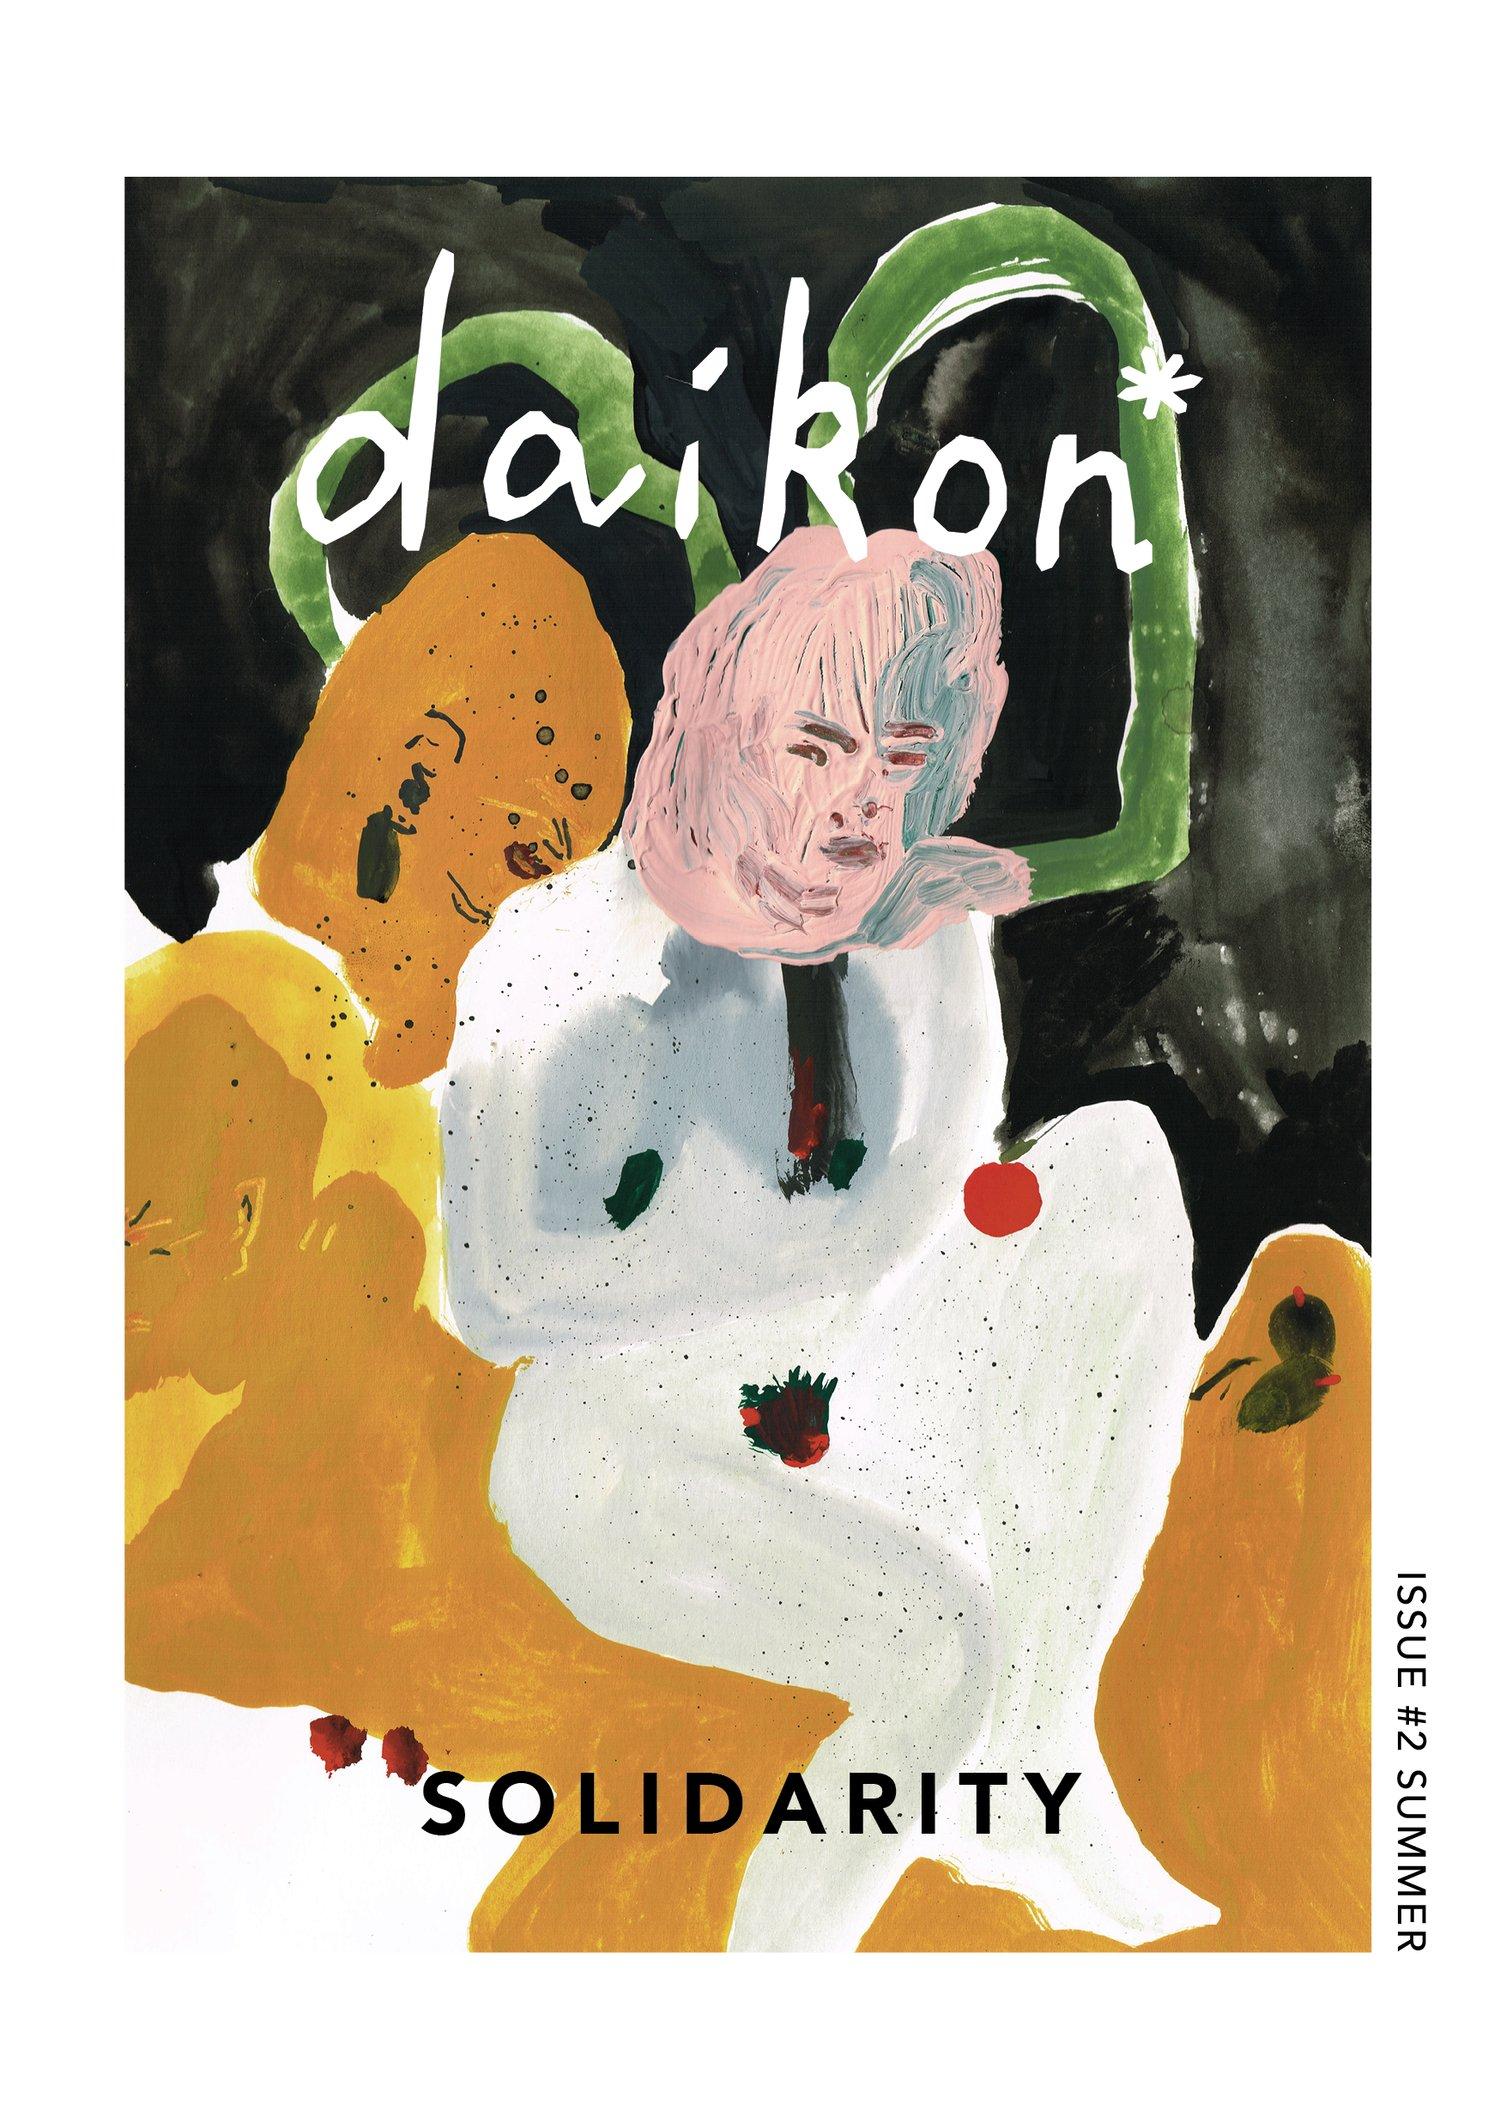 Image of daikon* zine issue #2 Summer